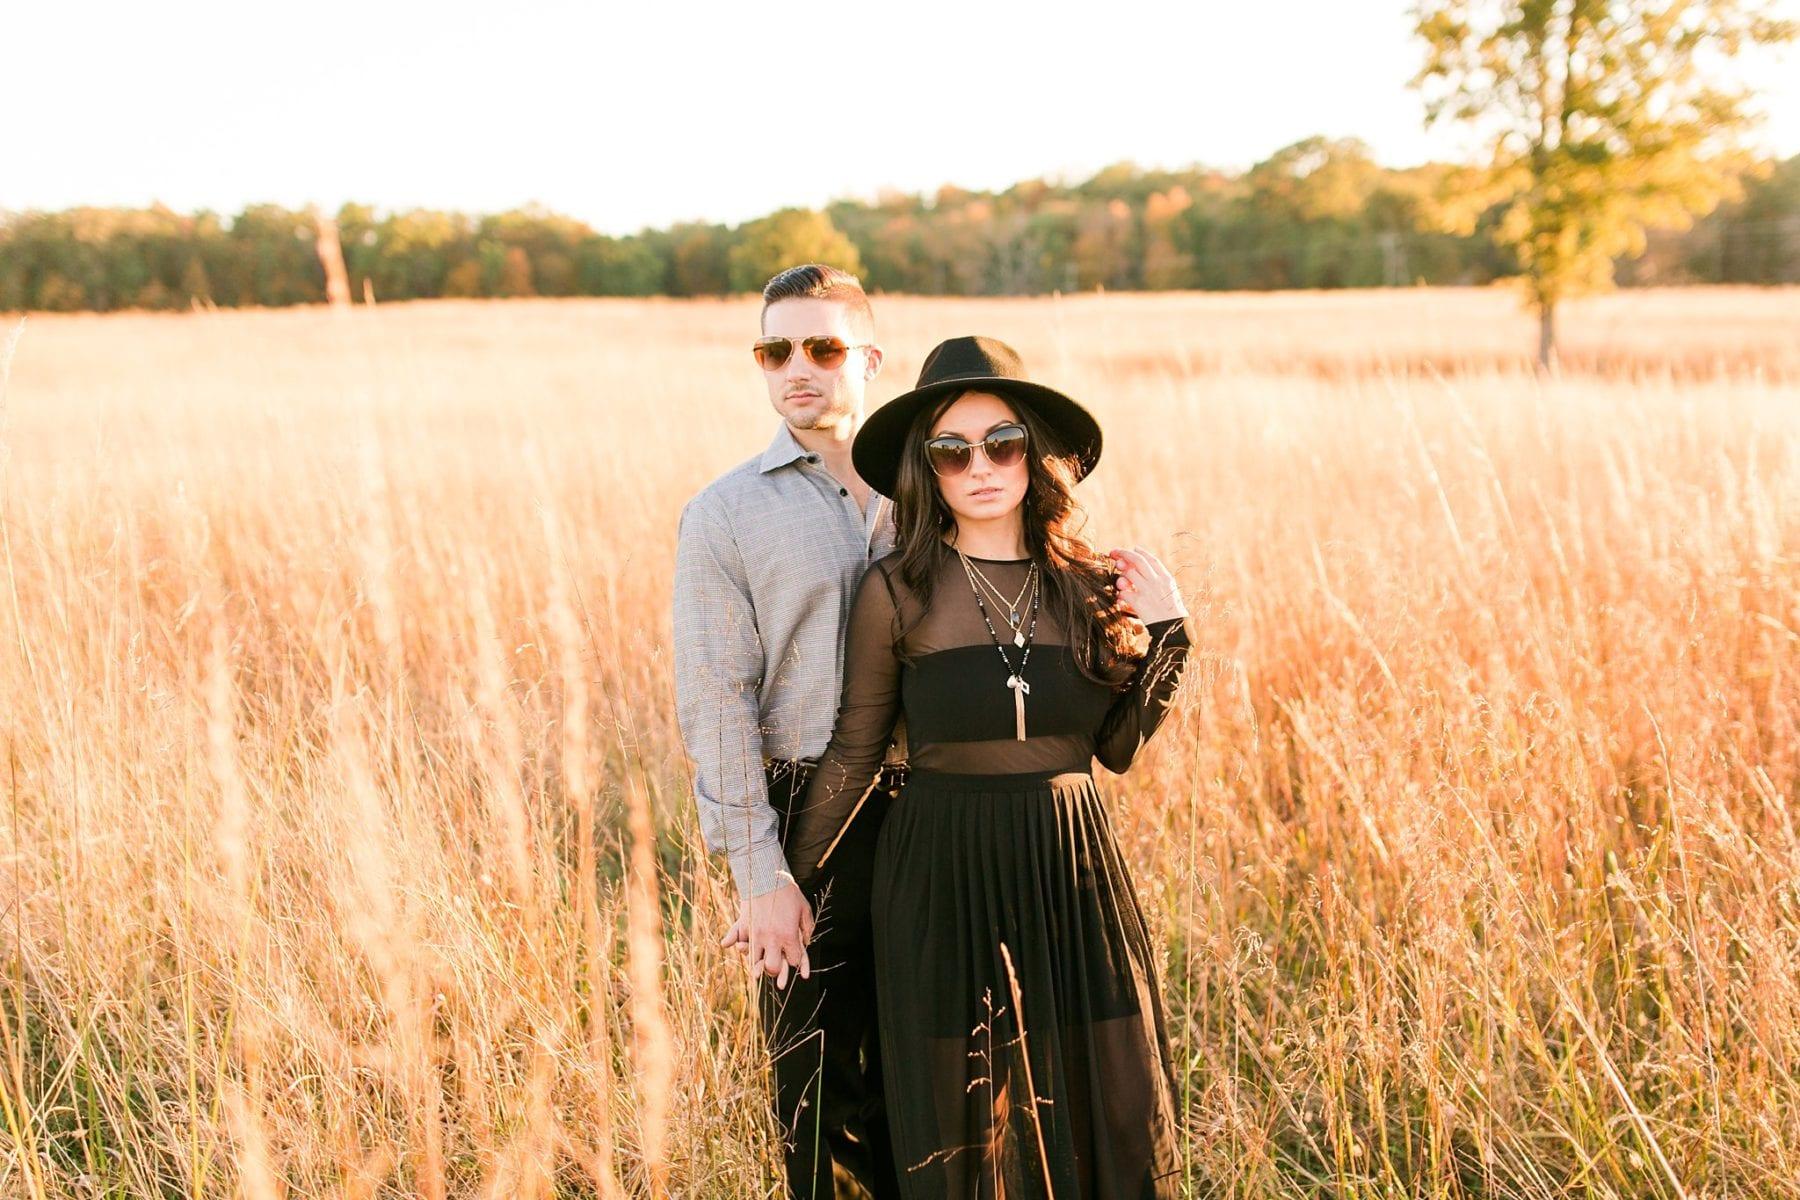 Manassas Battlefield Portraits Virginia Wedding Photographer Megan Kelsey Photography Lianne & Chris-212.jpg